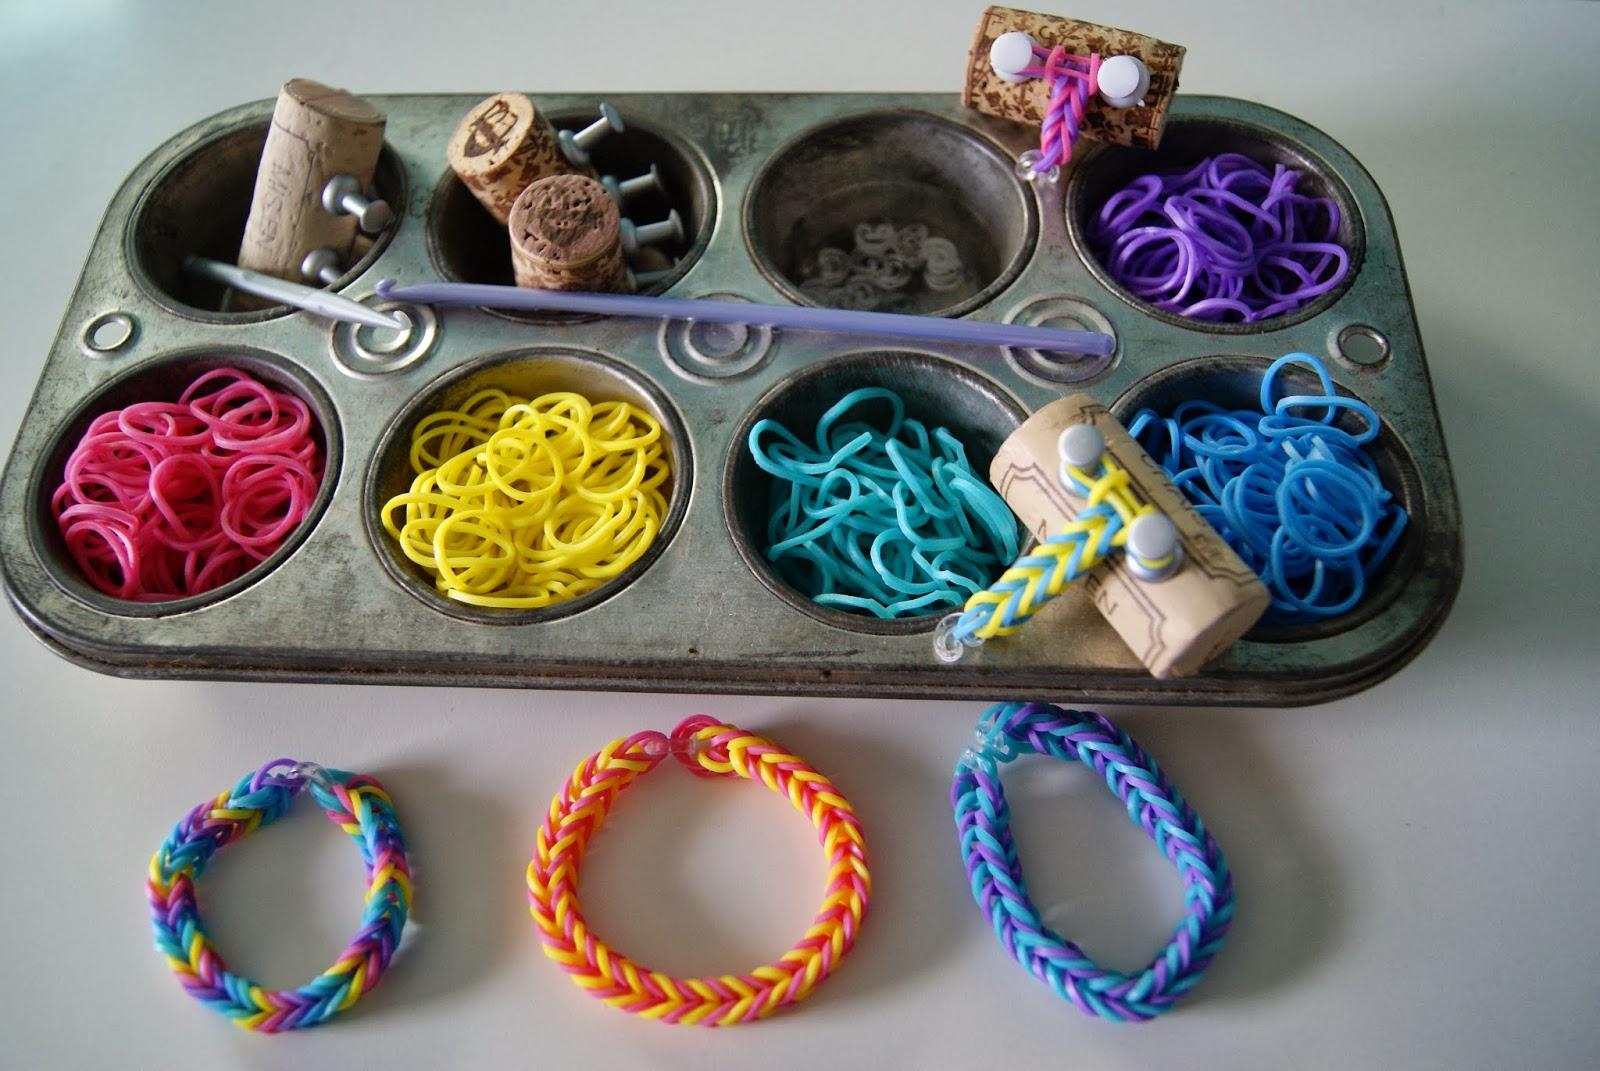 Weaving Rubber Band Bracelets